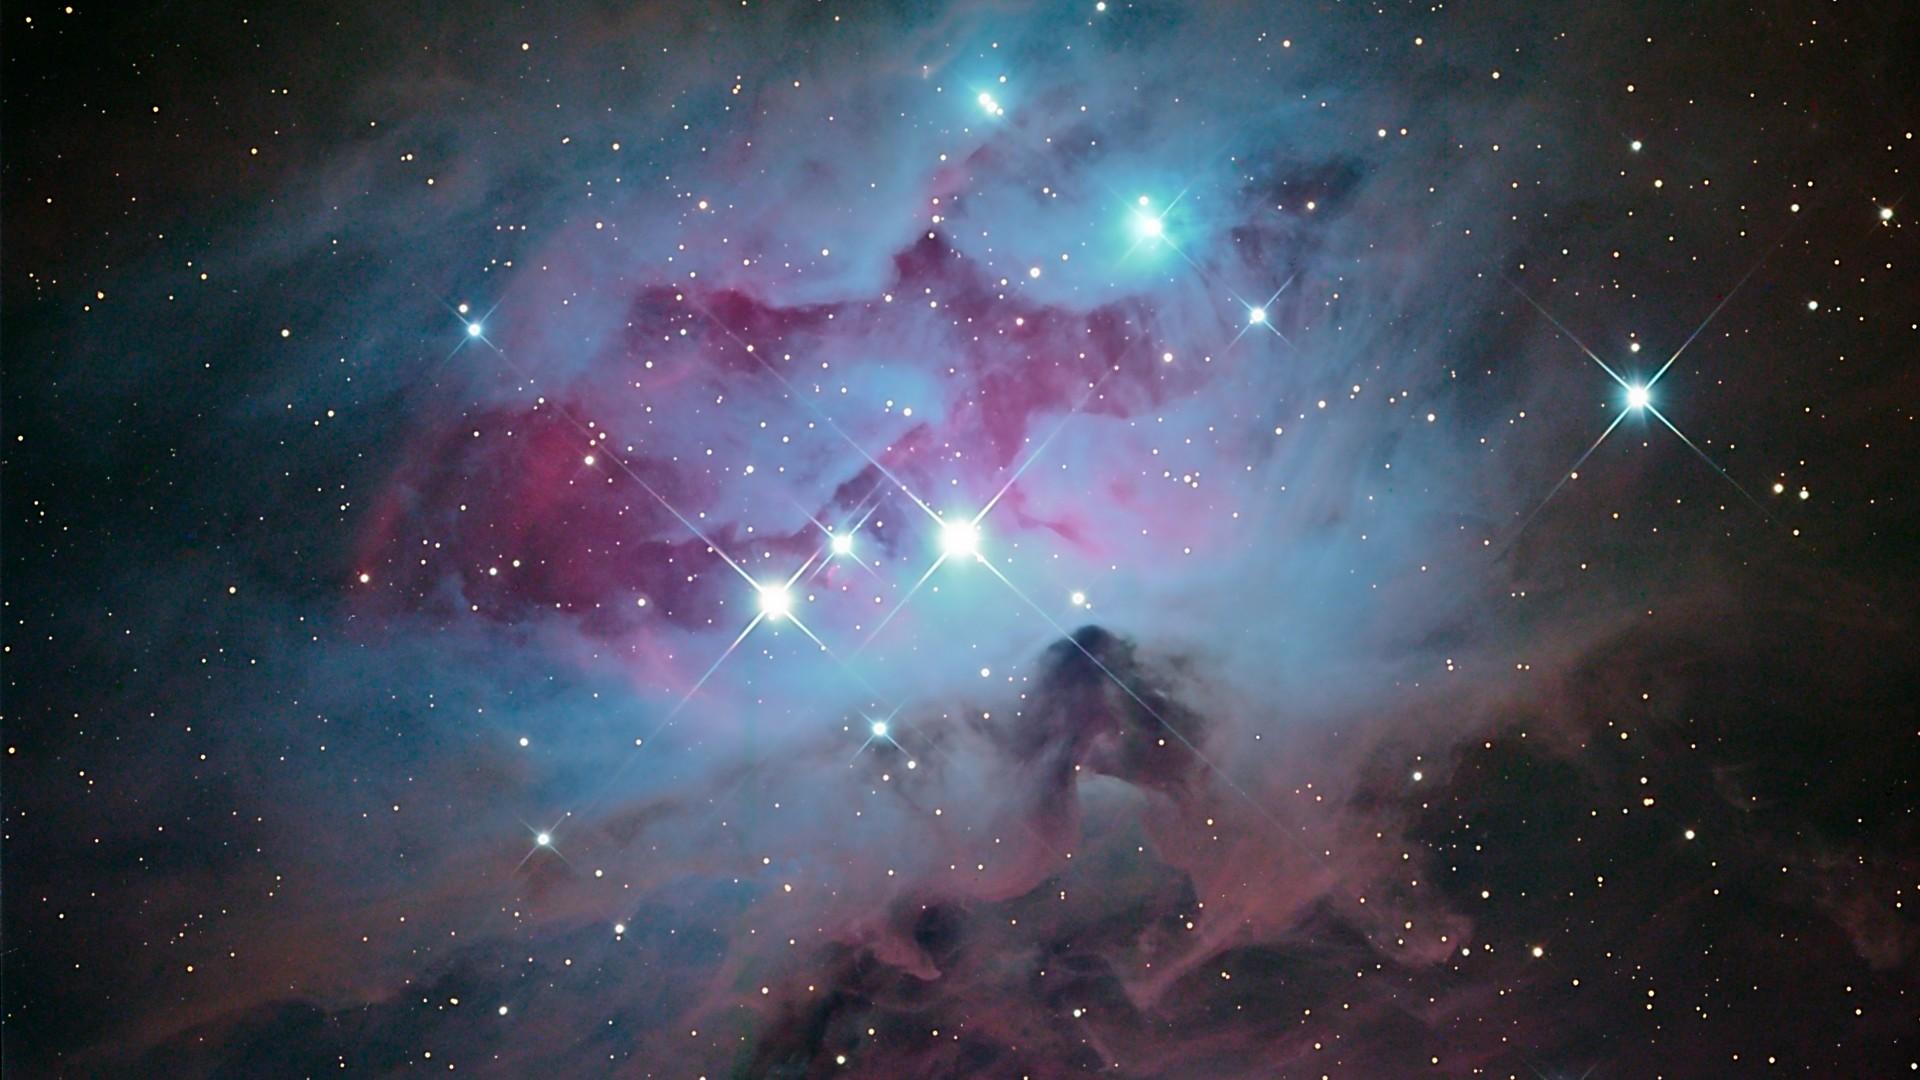 com1920orion nebula 192025C325971080 wallpaper free wallpapers 1920x1080